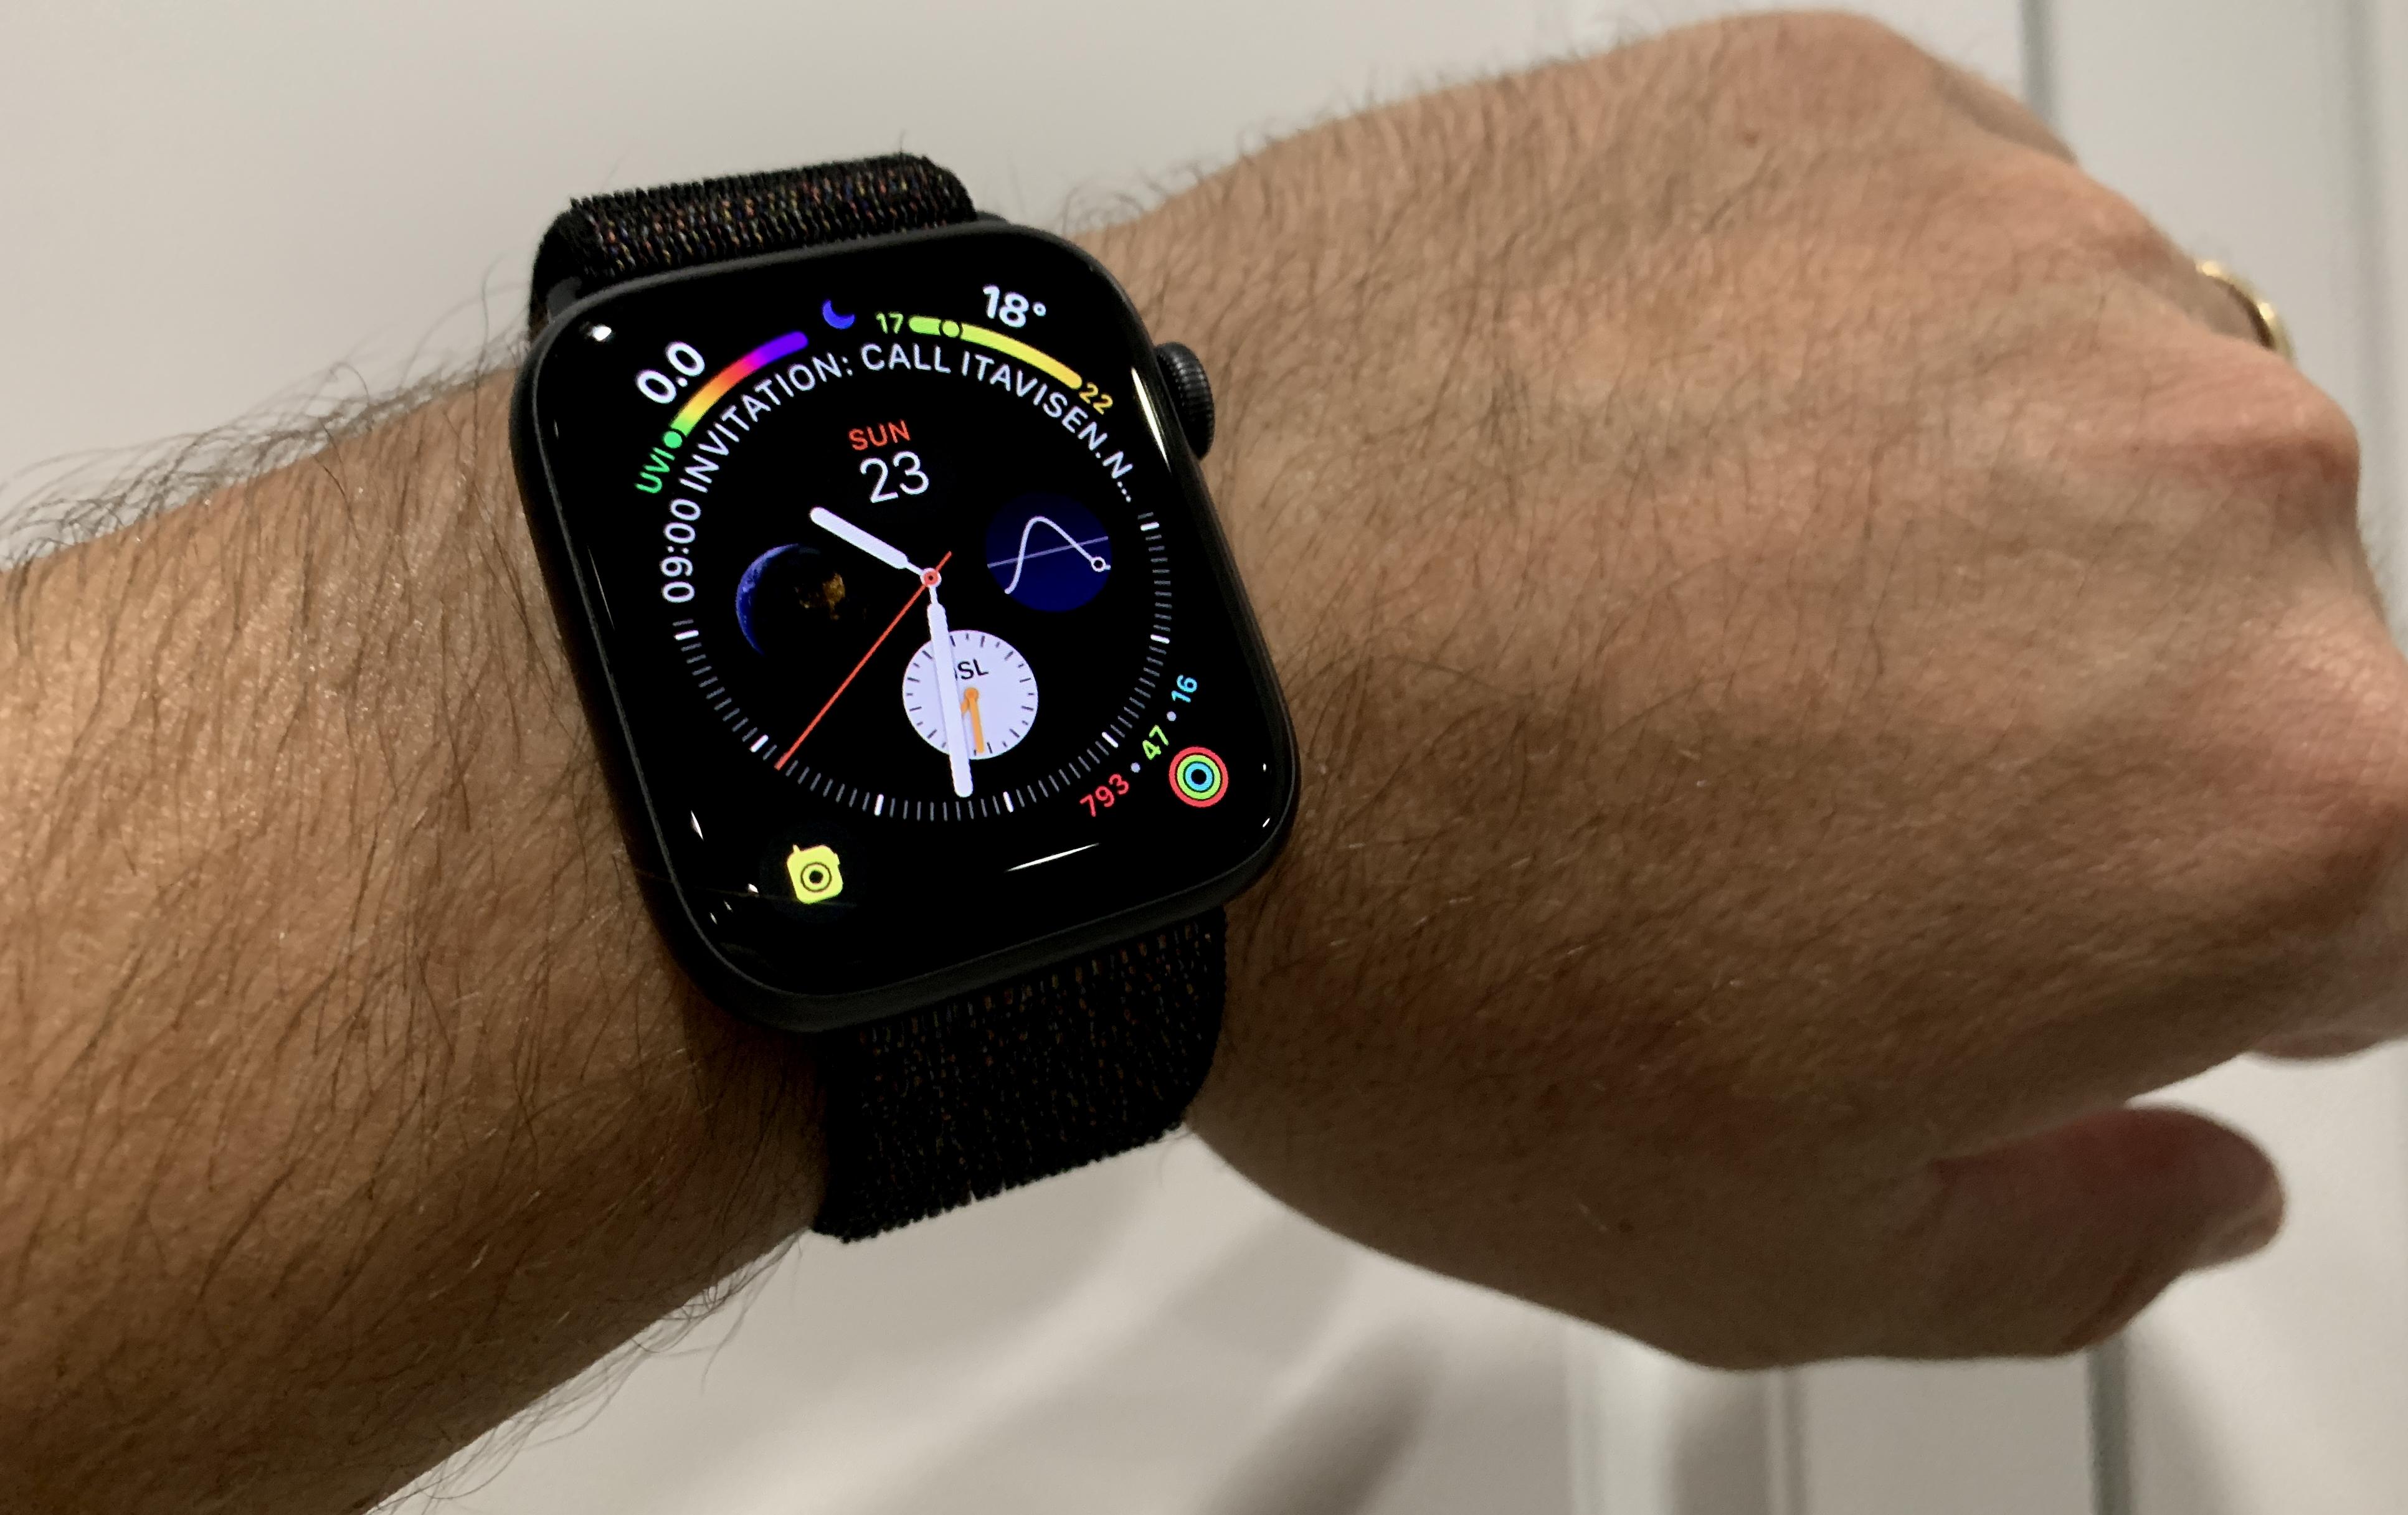 SNIKTITT: Apple Watch Series 4 LTE